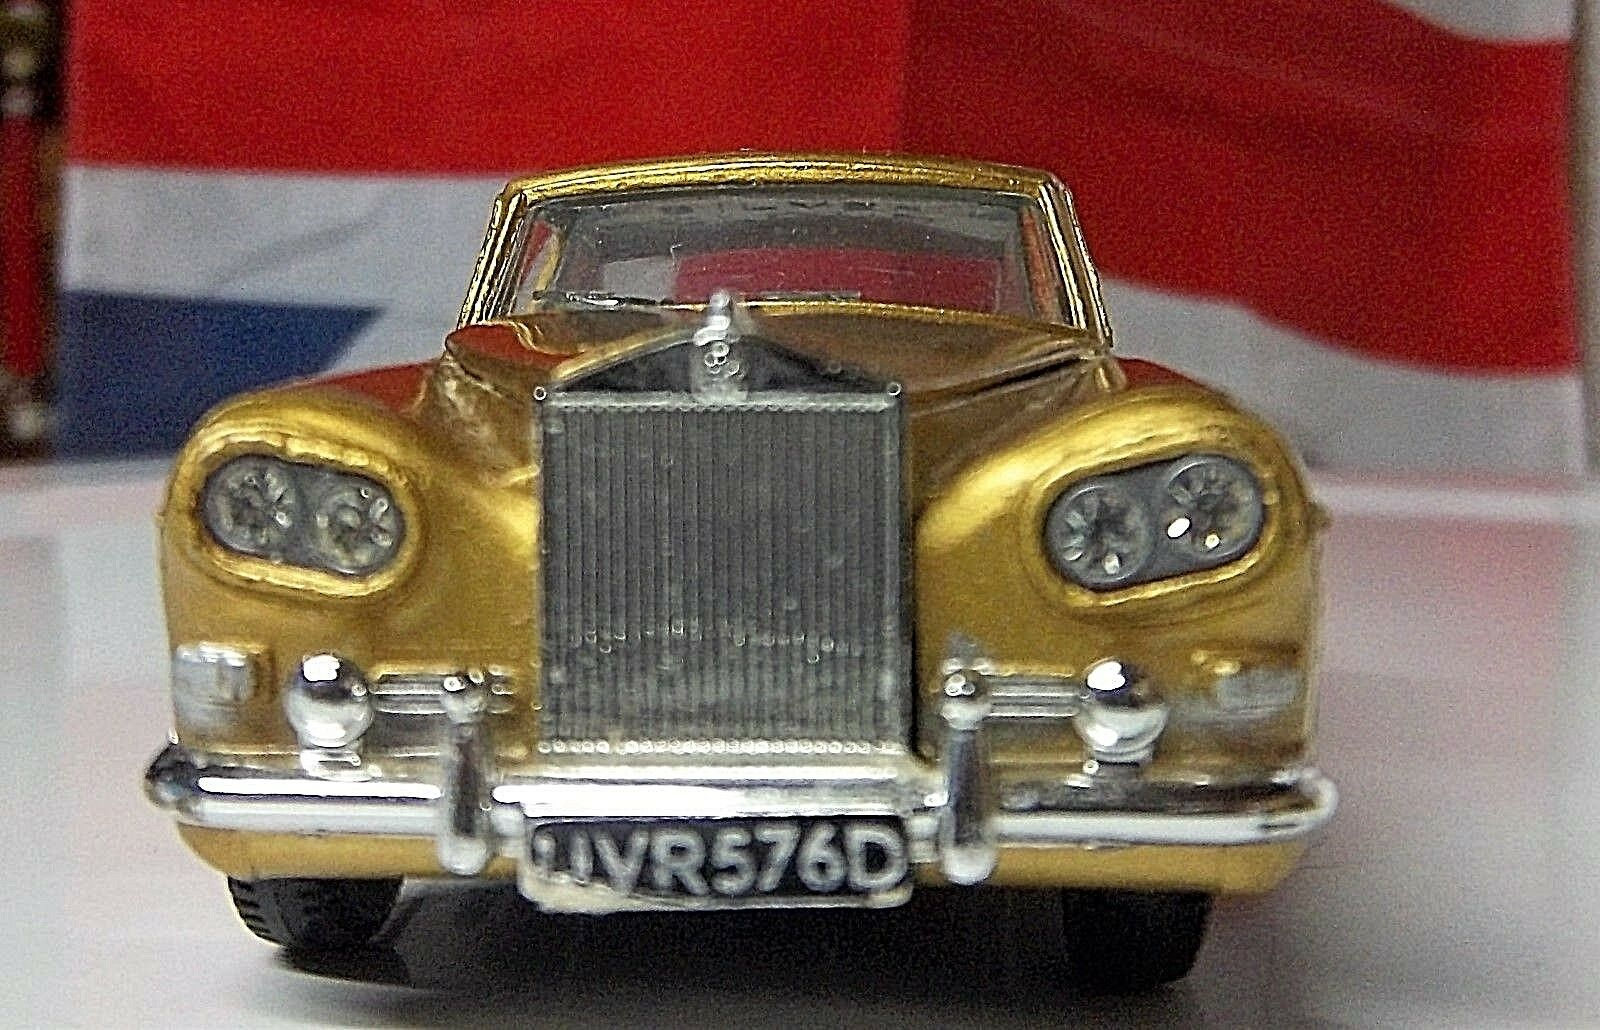 Gold ROLLS ROYCE Silber CLOUD METALLIC from England Original Dinky Rolls Royce